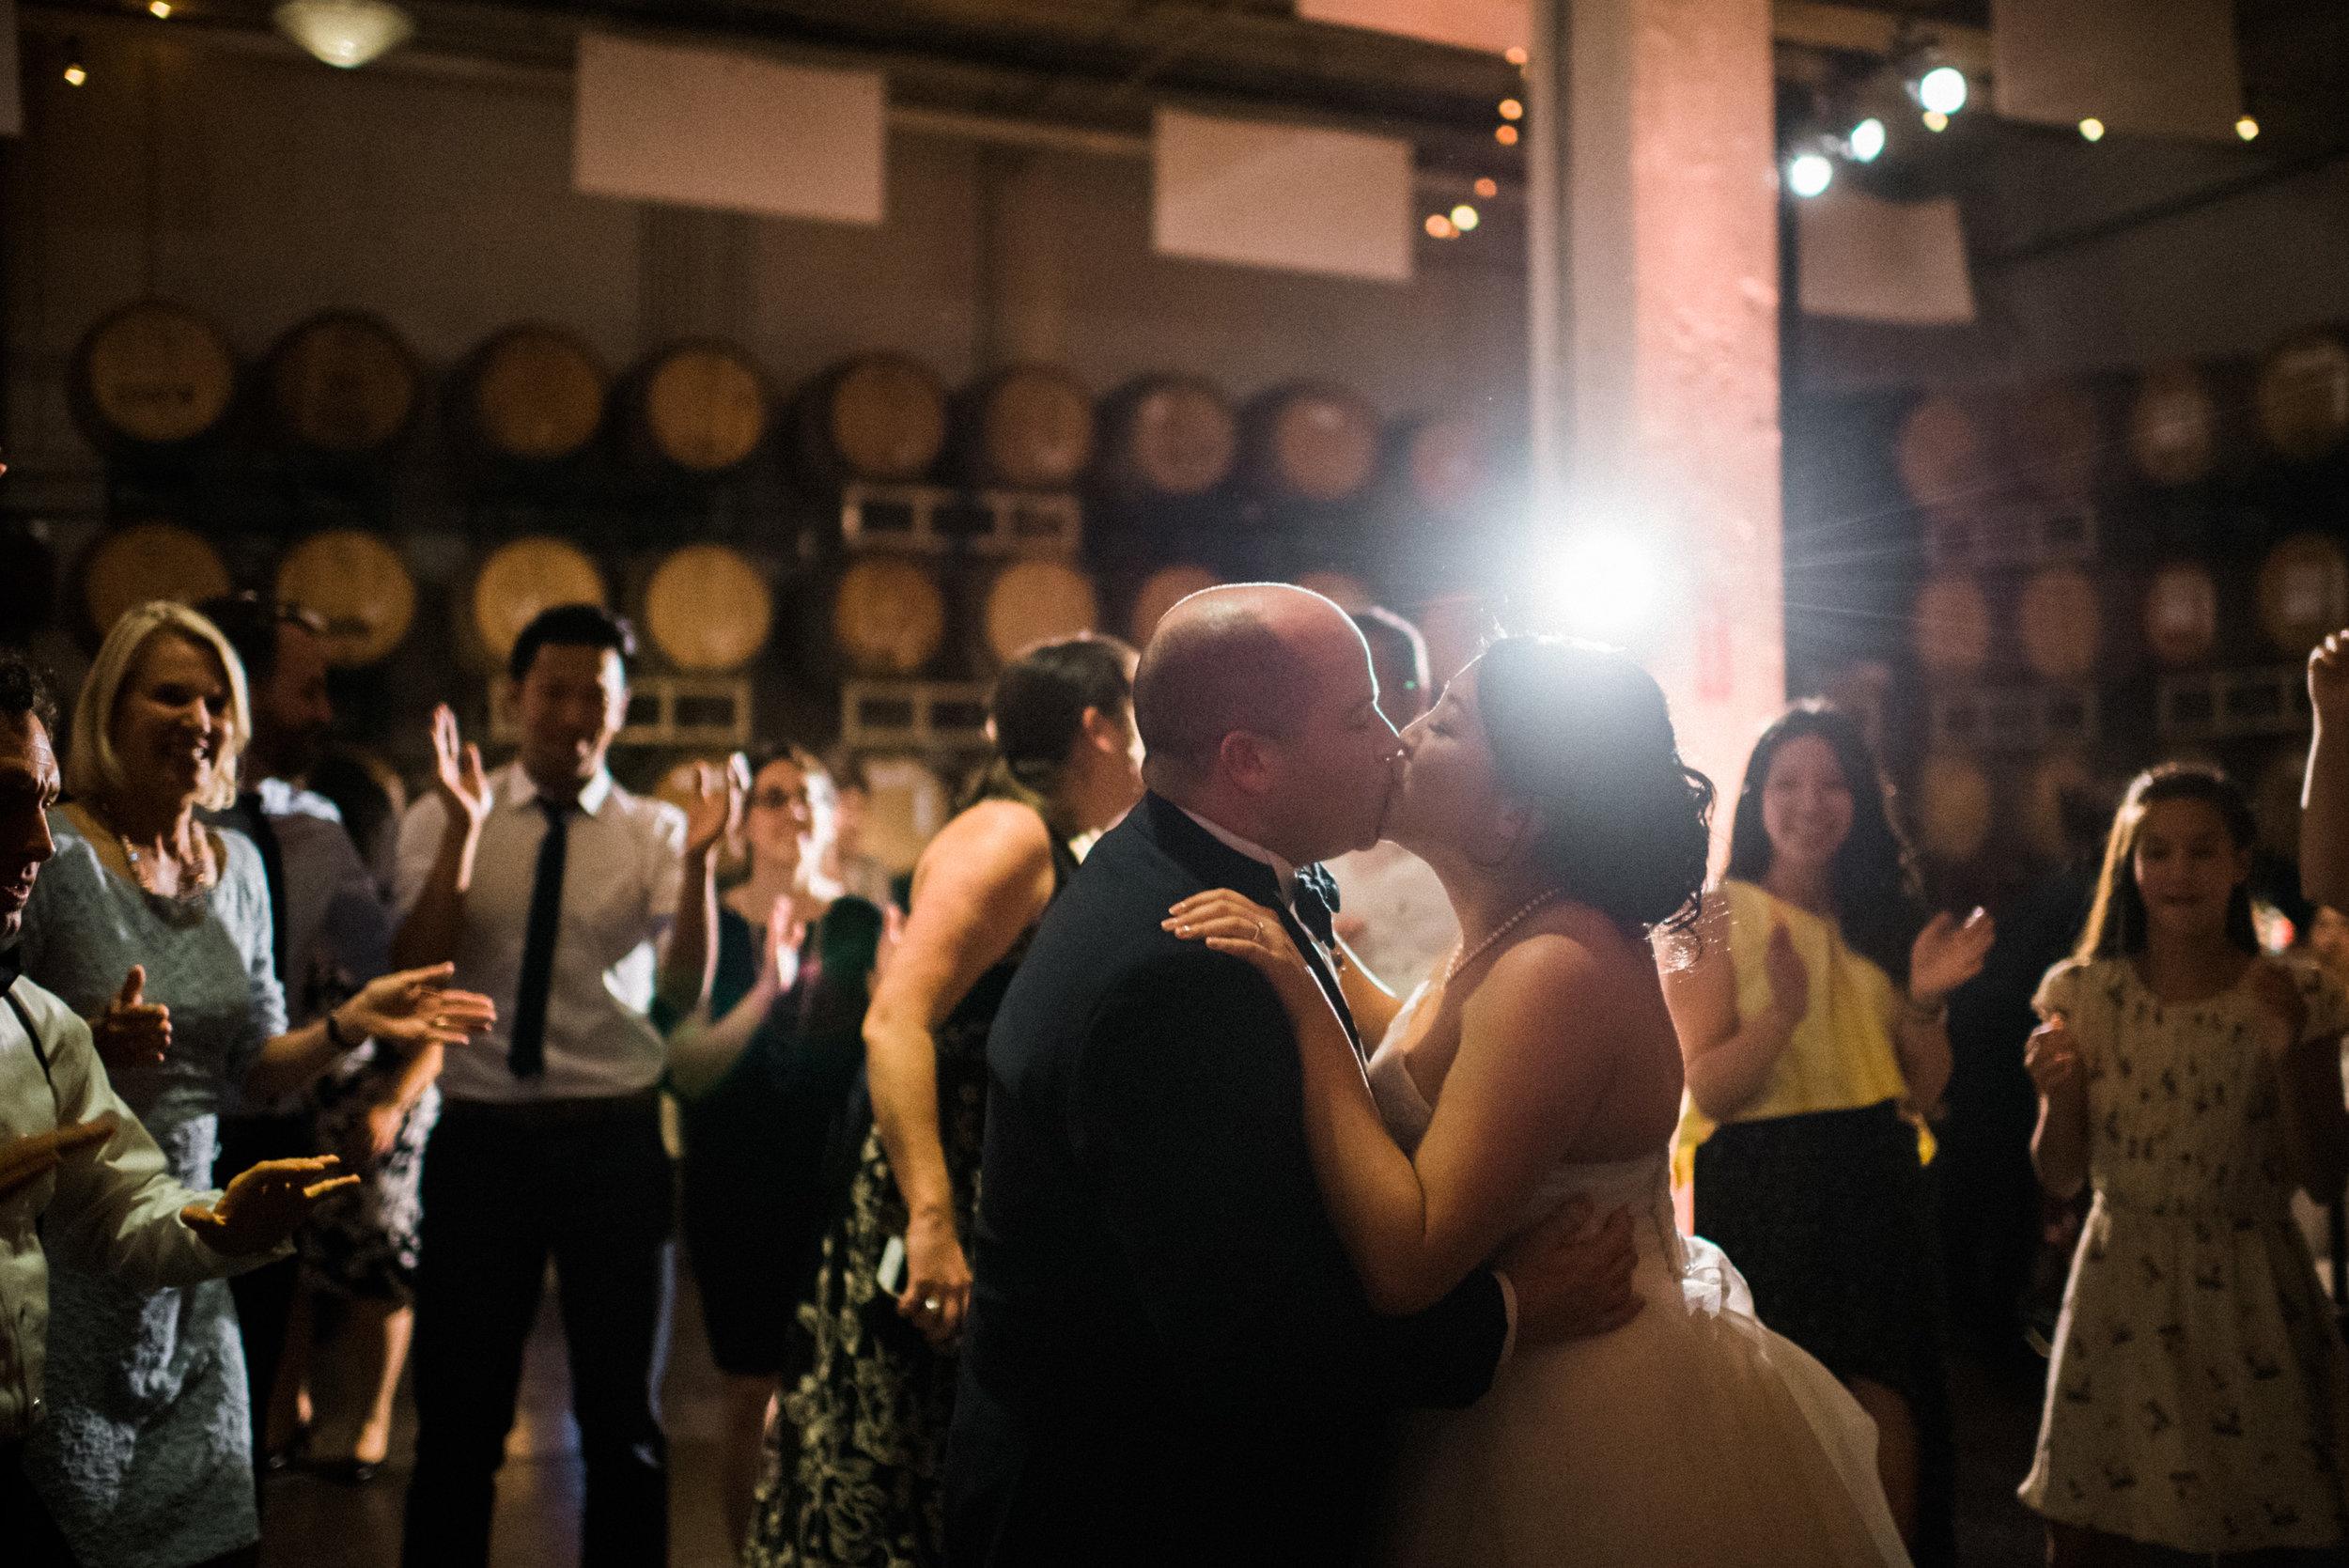 Swedenborgian Church Dogpatch Winery Wedding092.jpg